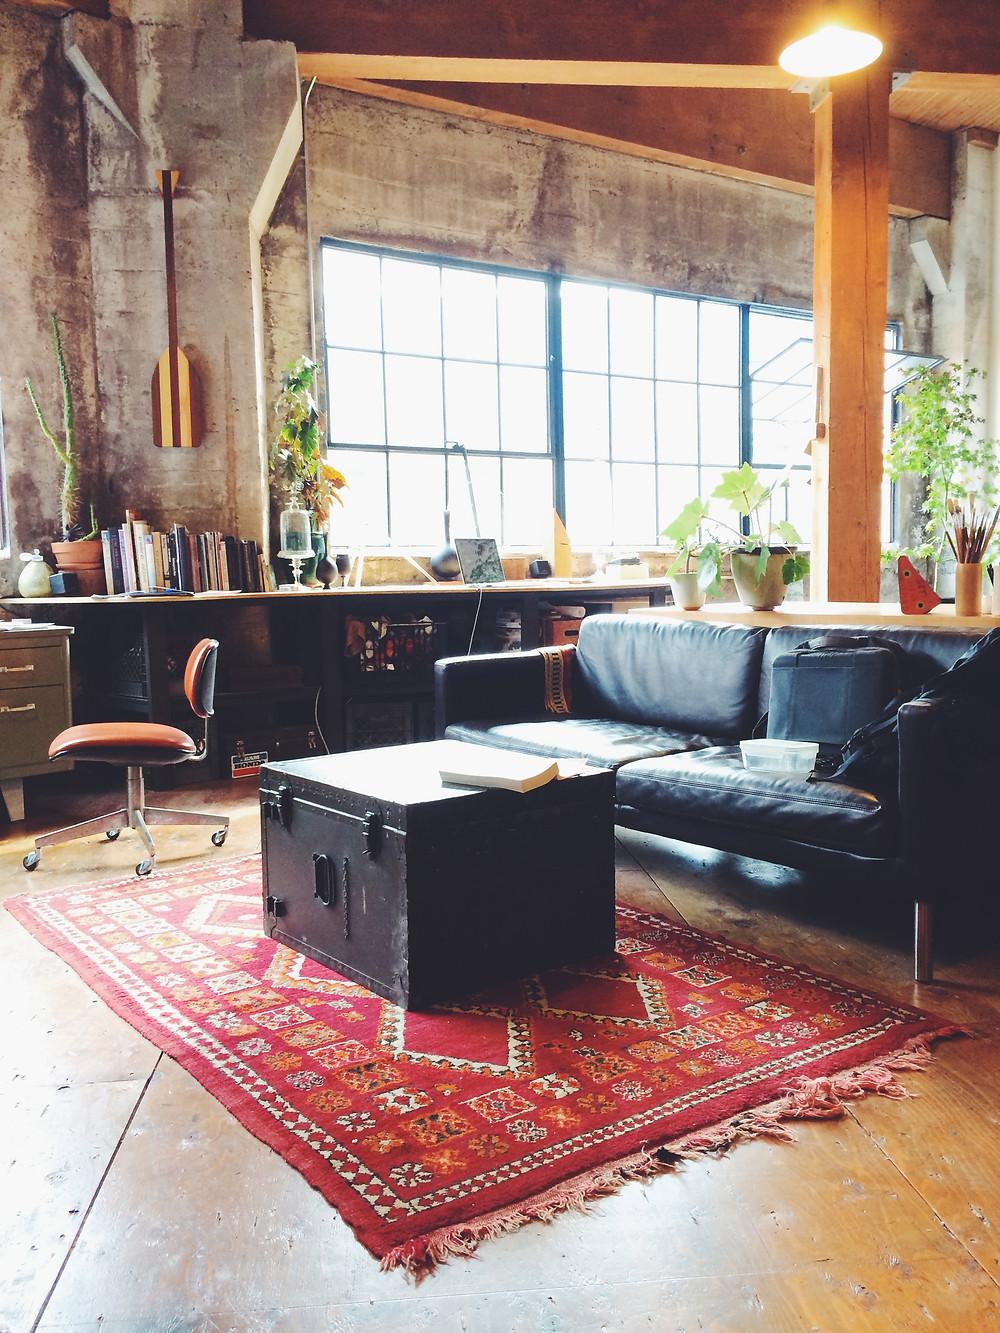 Andrew and Andy's studio